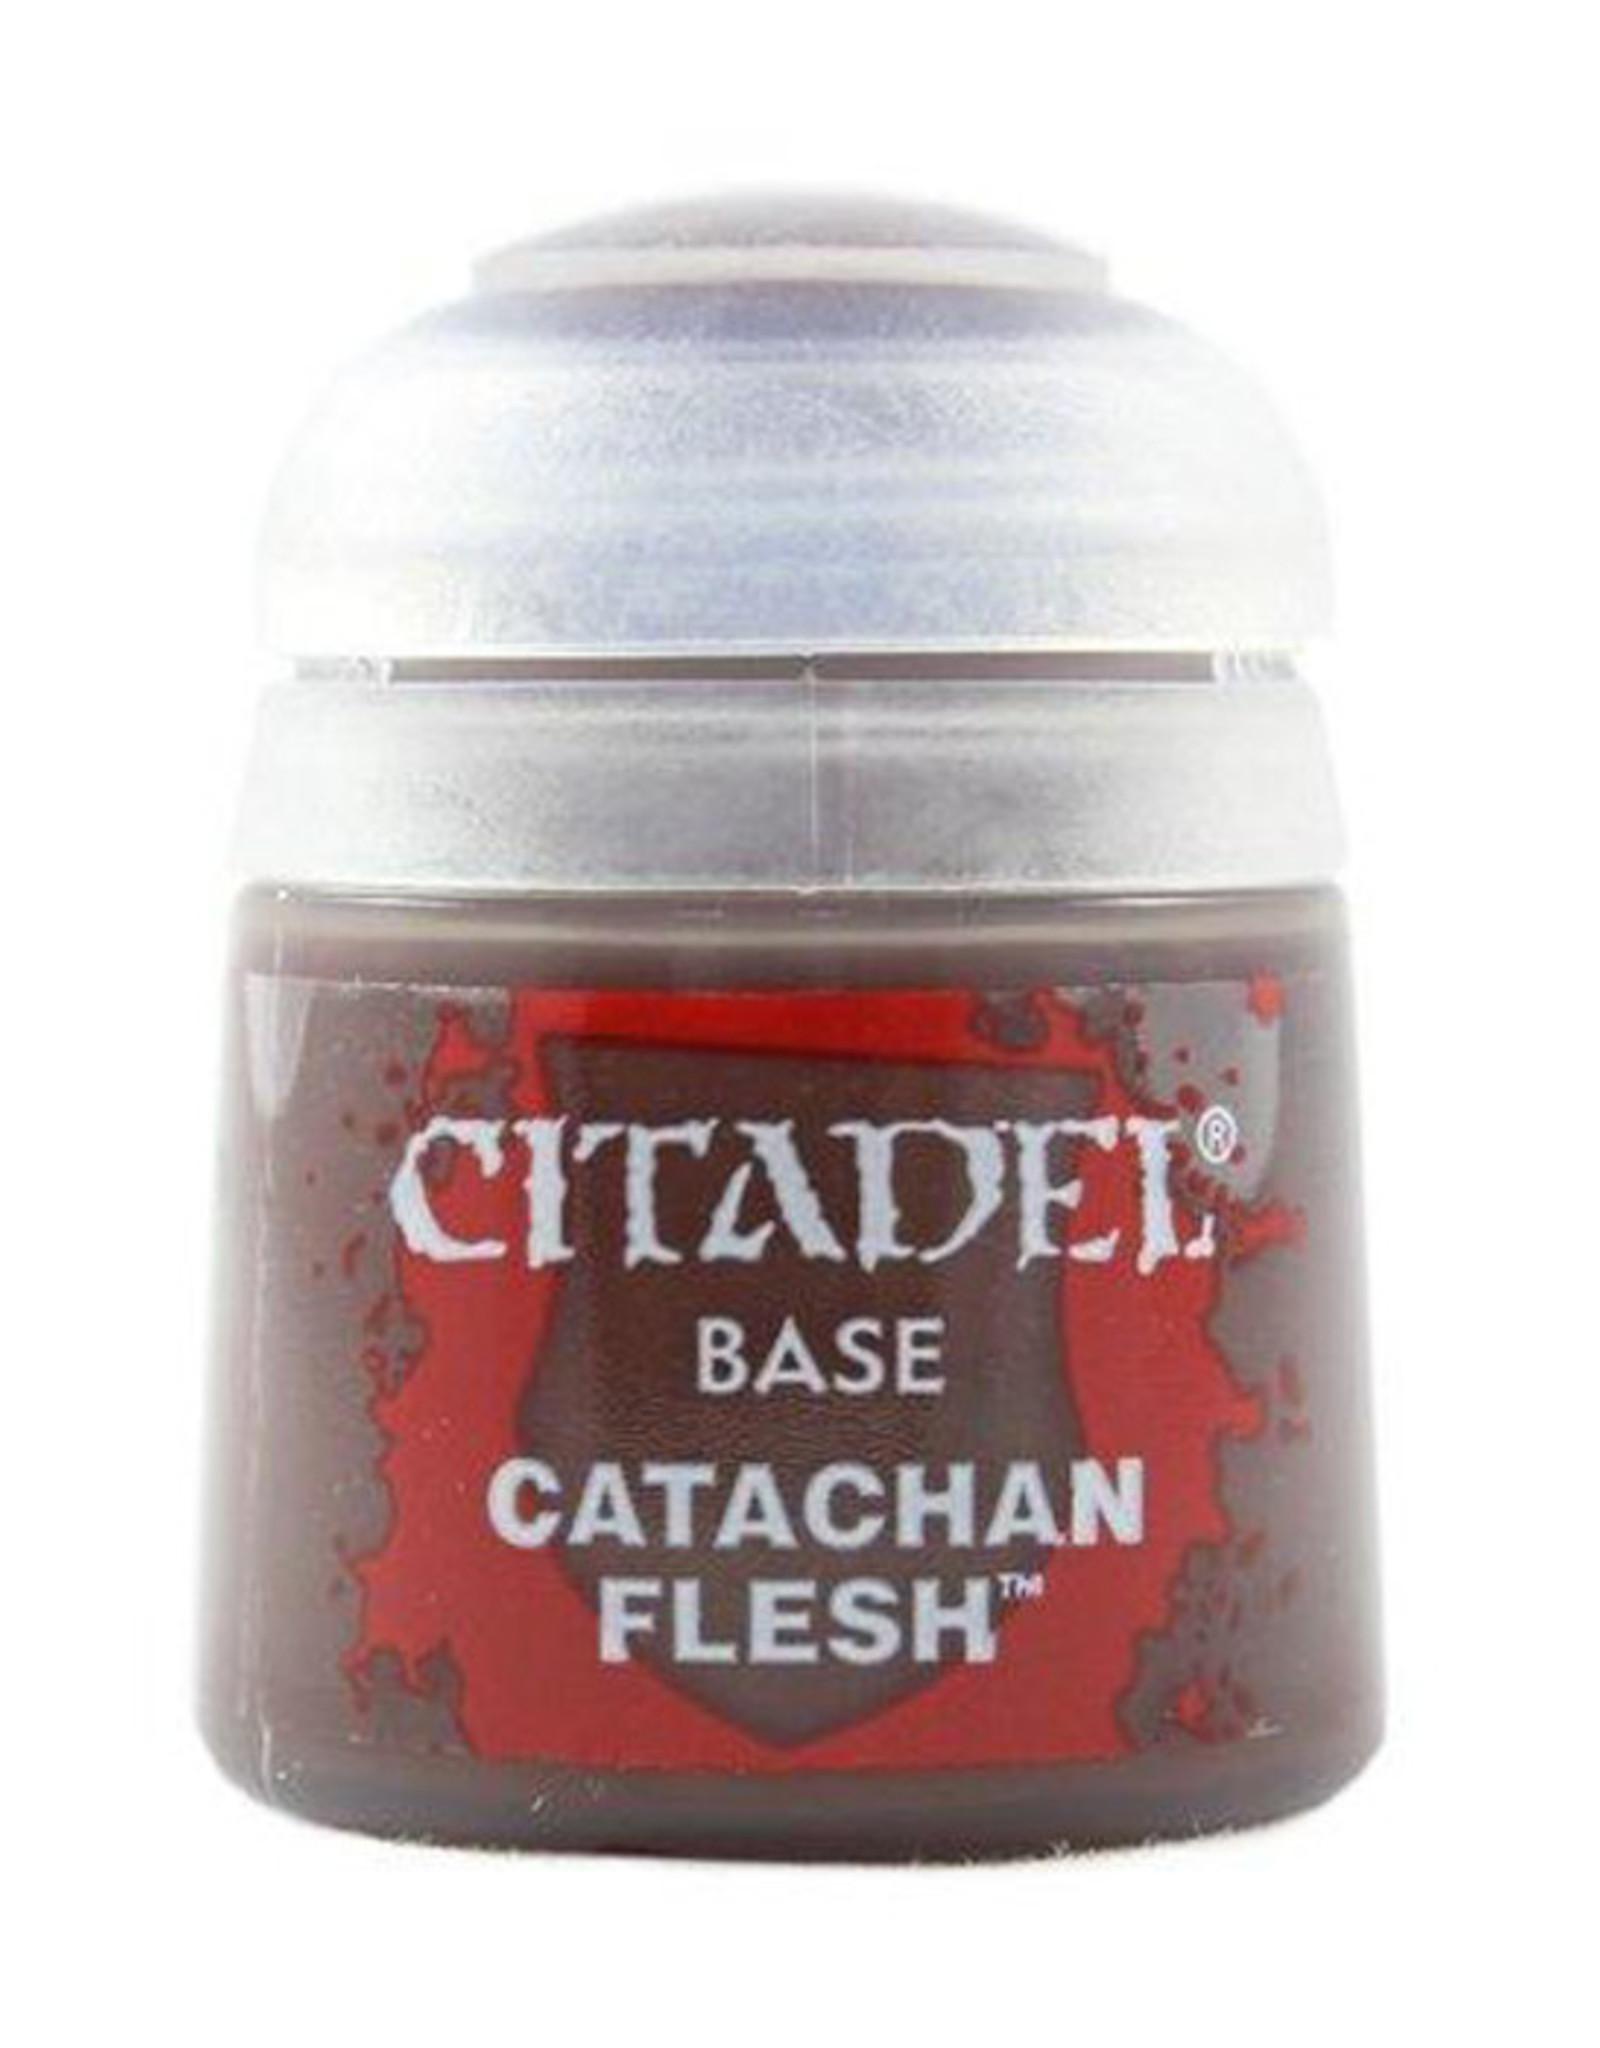 Citadel Citadel Colour: Base - Catachan Fleshtone